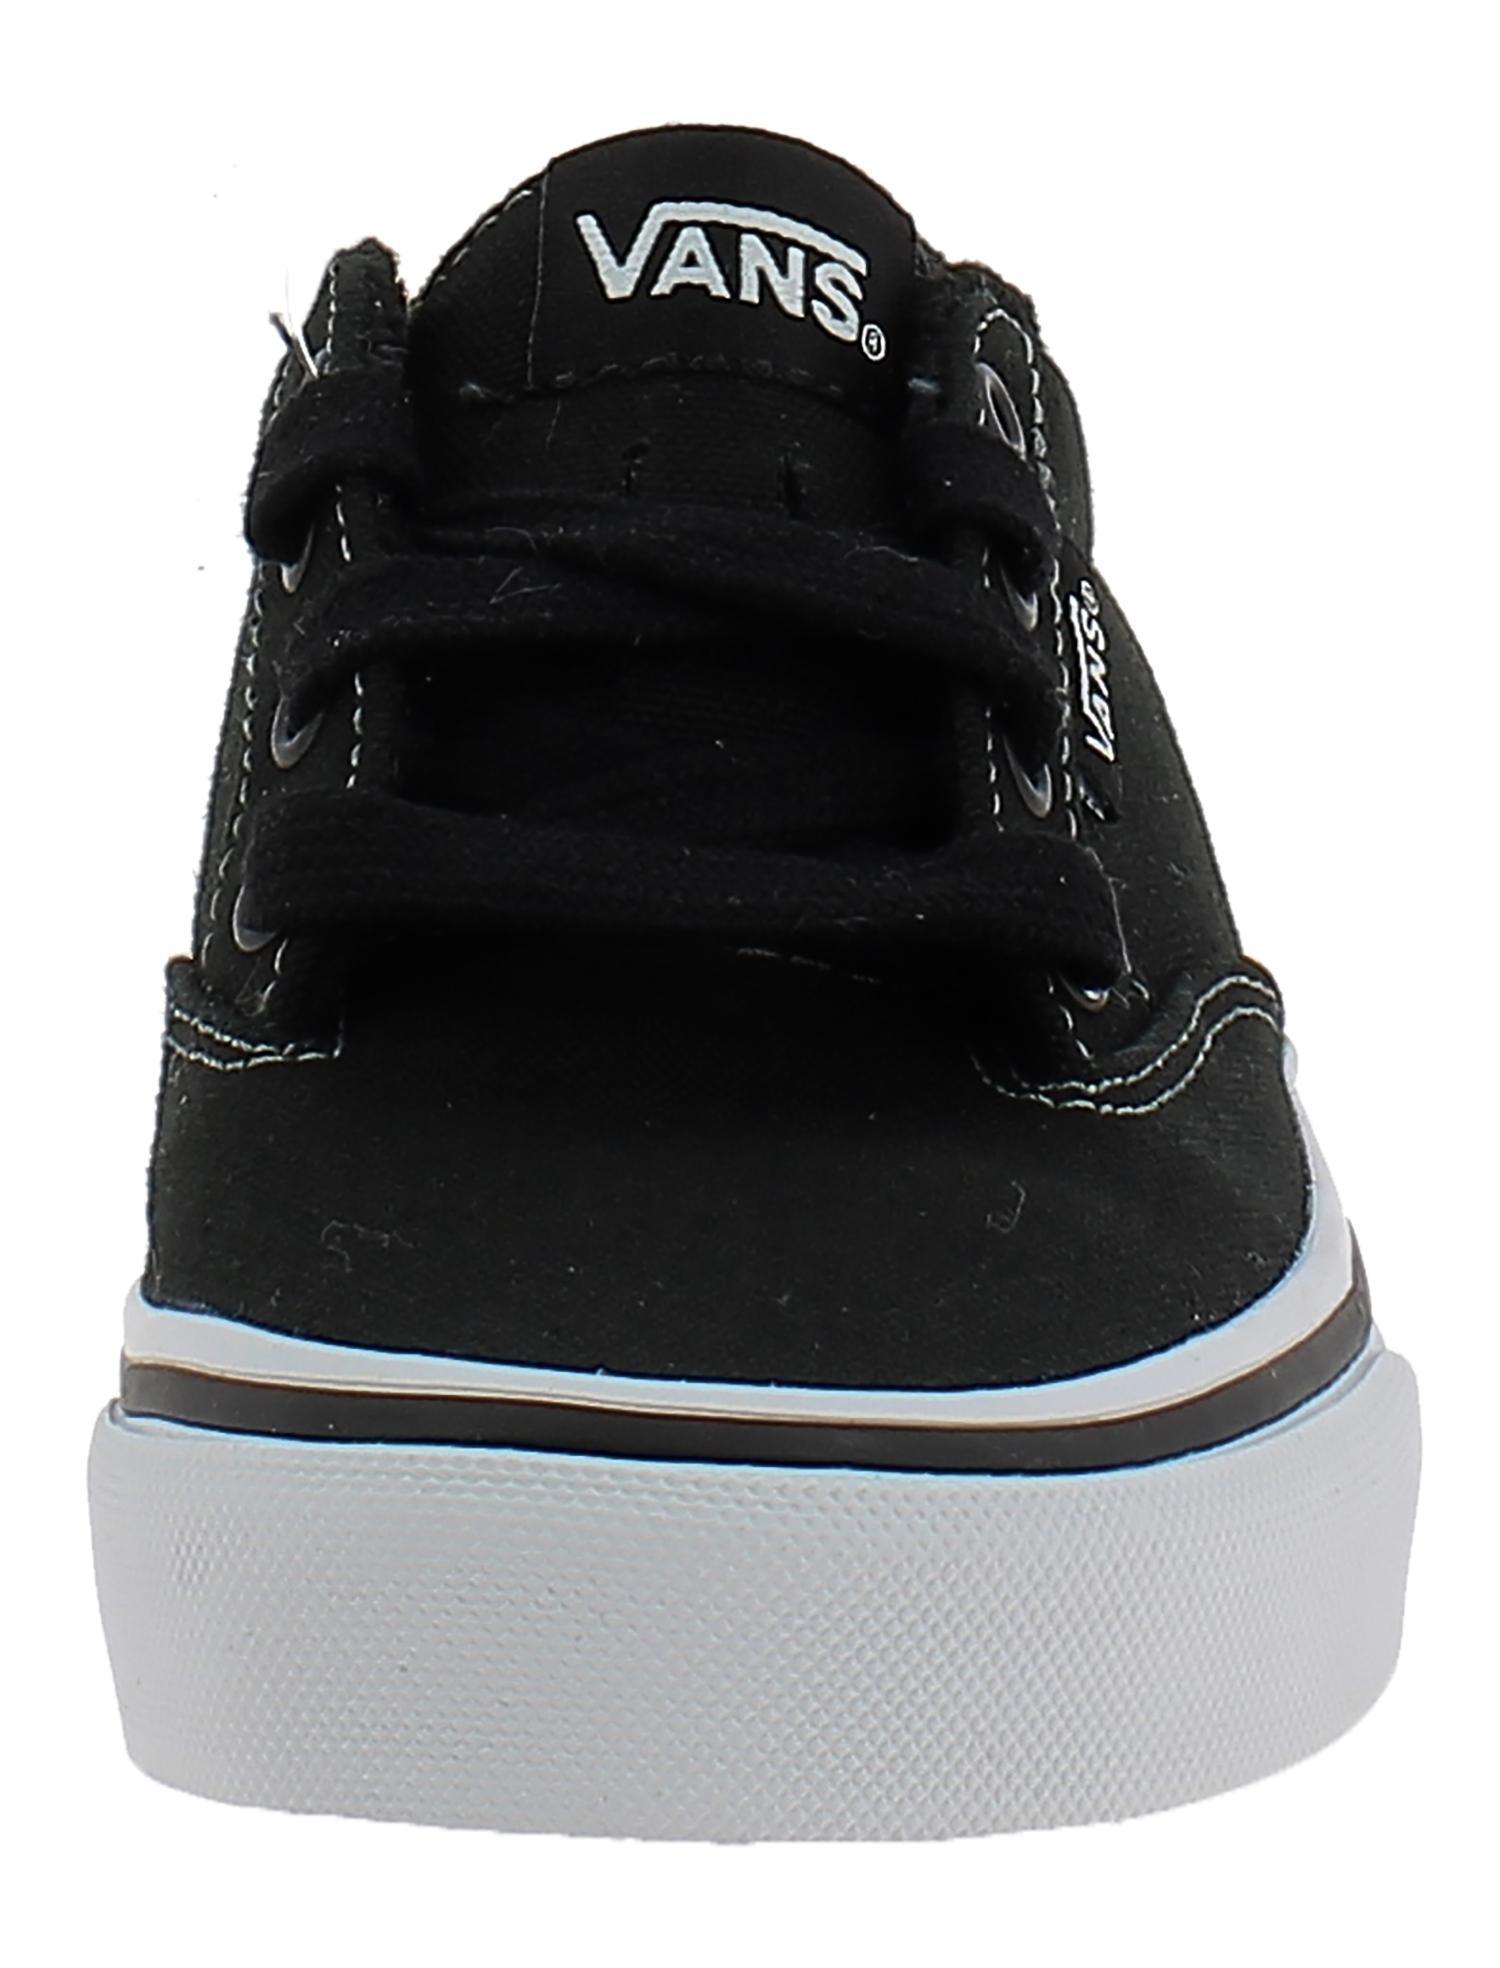 vans vans winston scarpe bambino nere tela vo4187